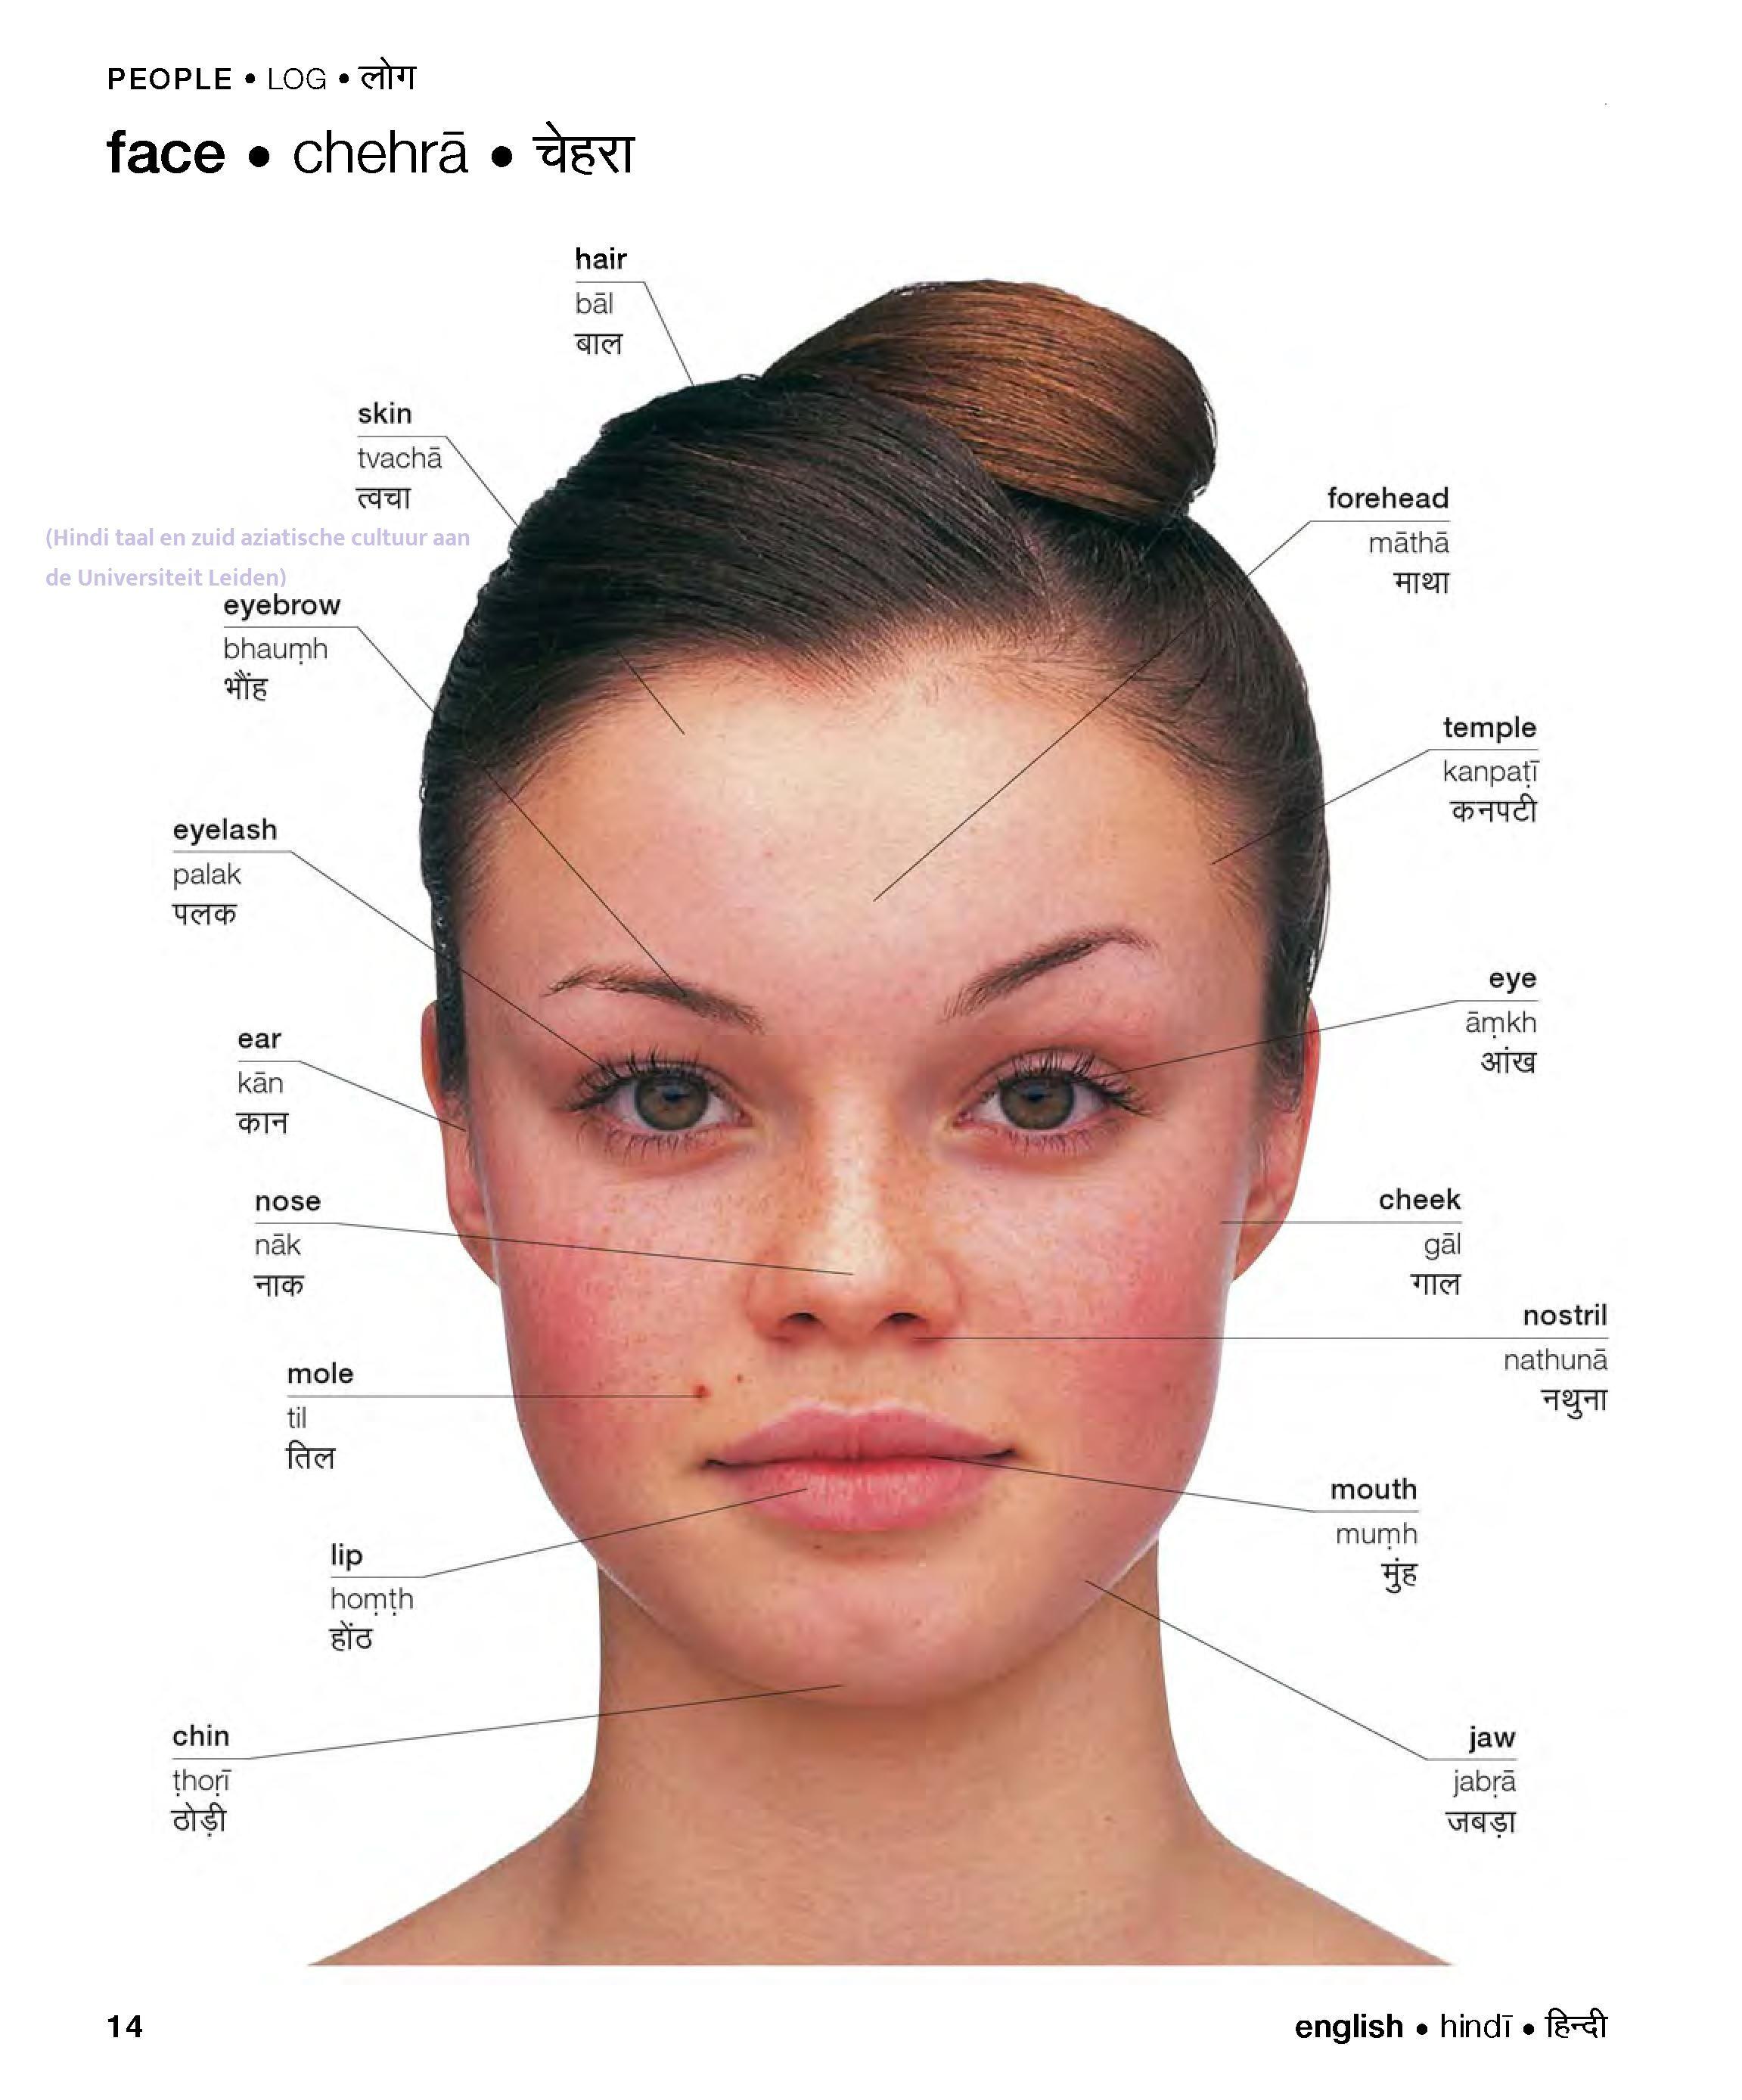 Hindi Words for body parts - Face (Hindi taal en zuid ...